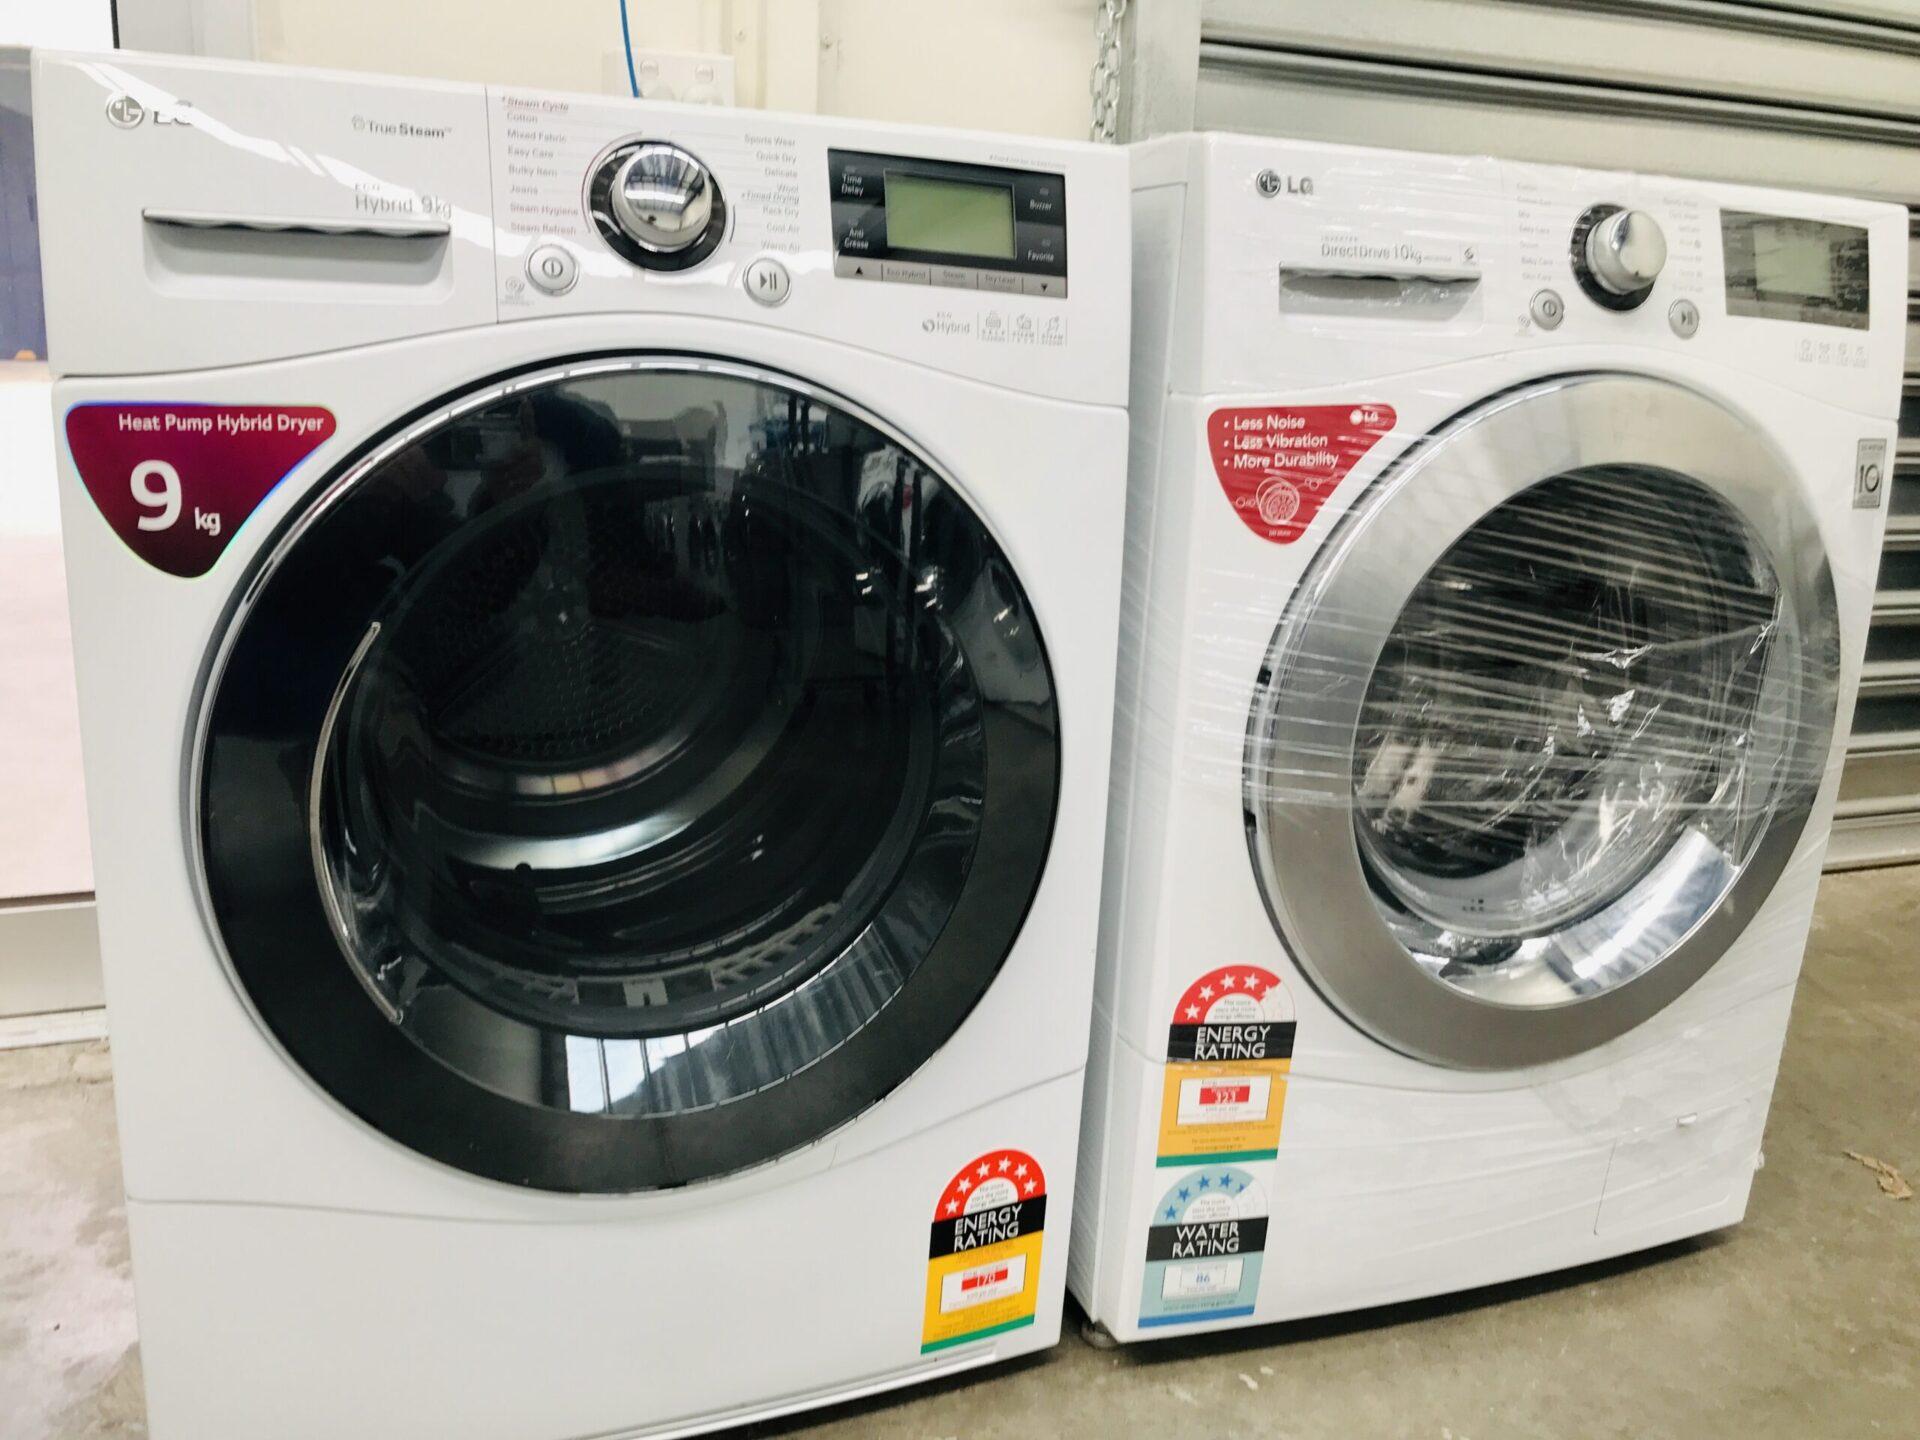 LG 10kg Front Load LG Washing Machine & LG  9kg Heat Pump Hybrid Dryer WD14070D6 TD-C902H